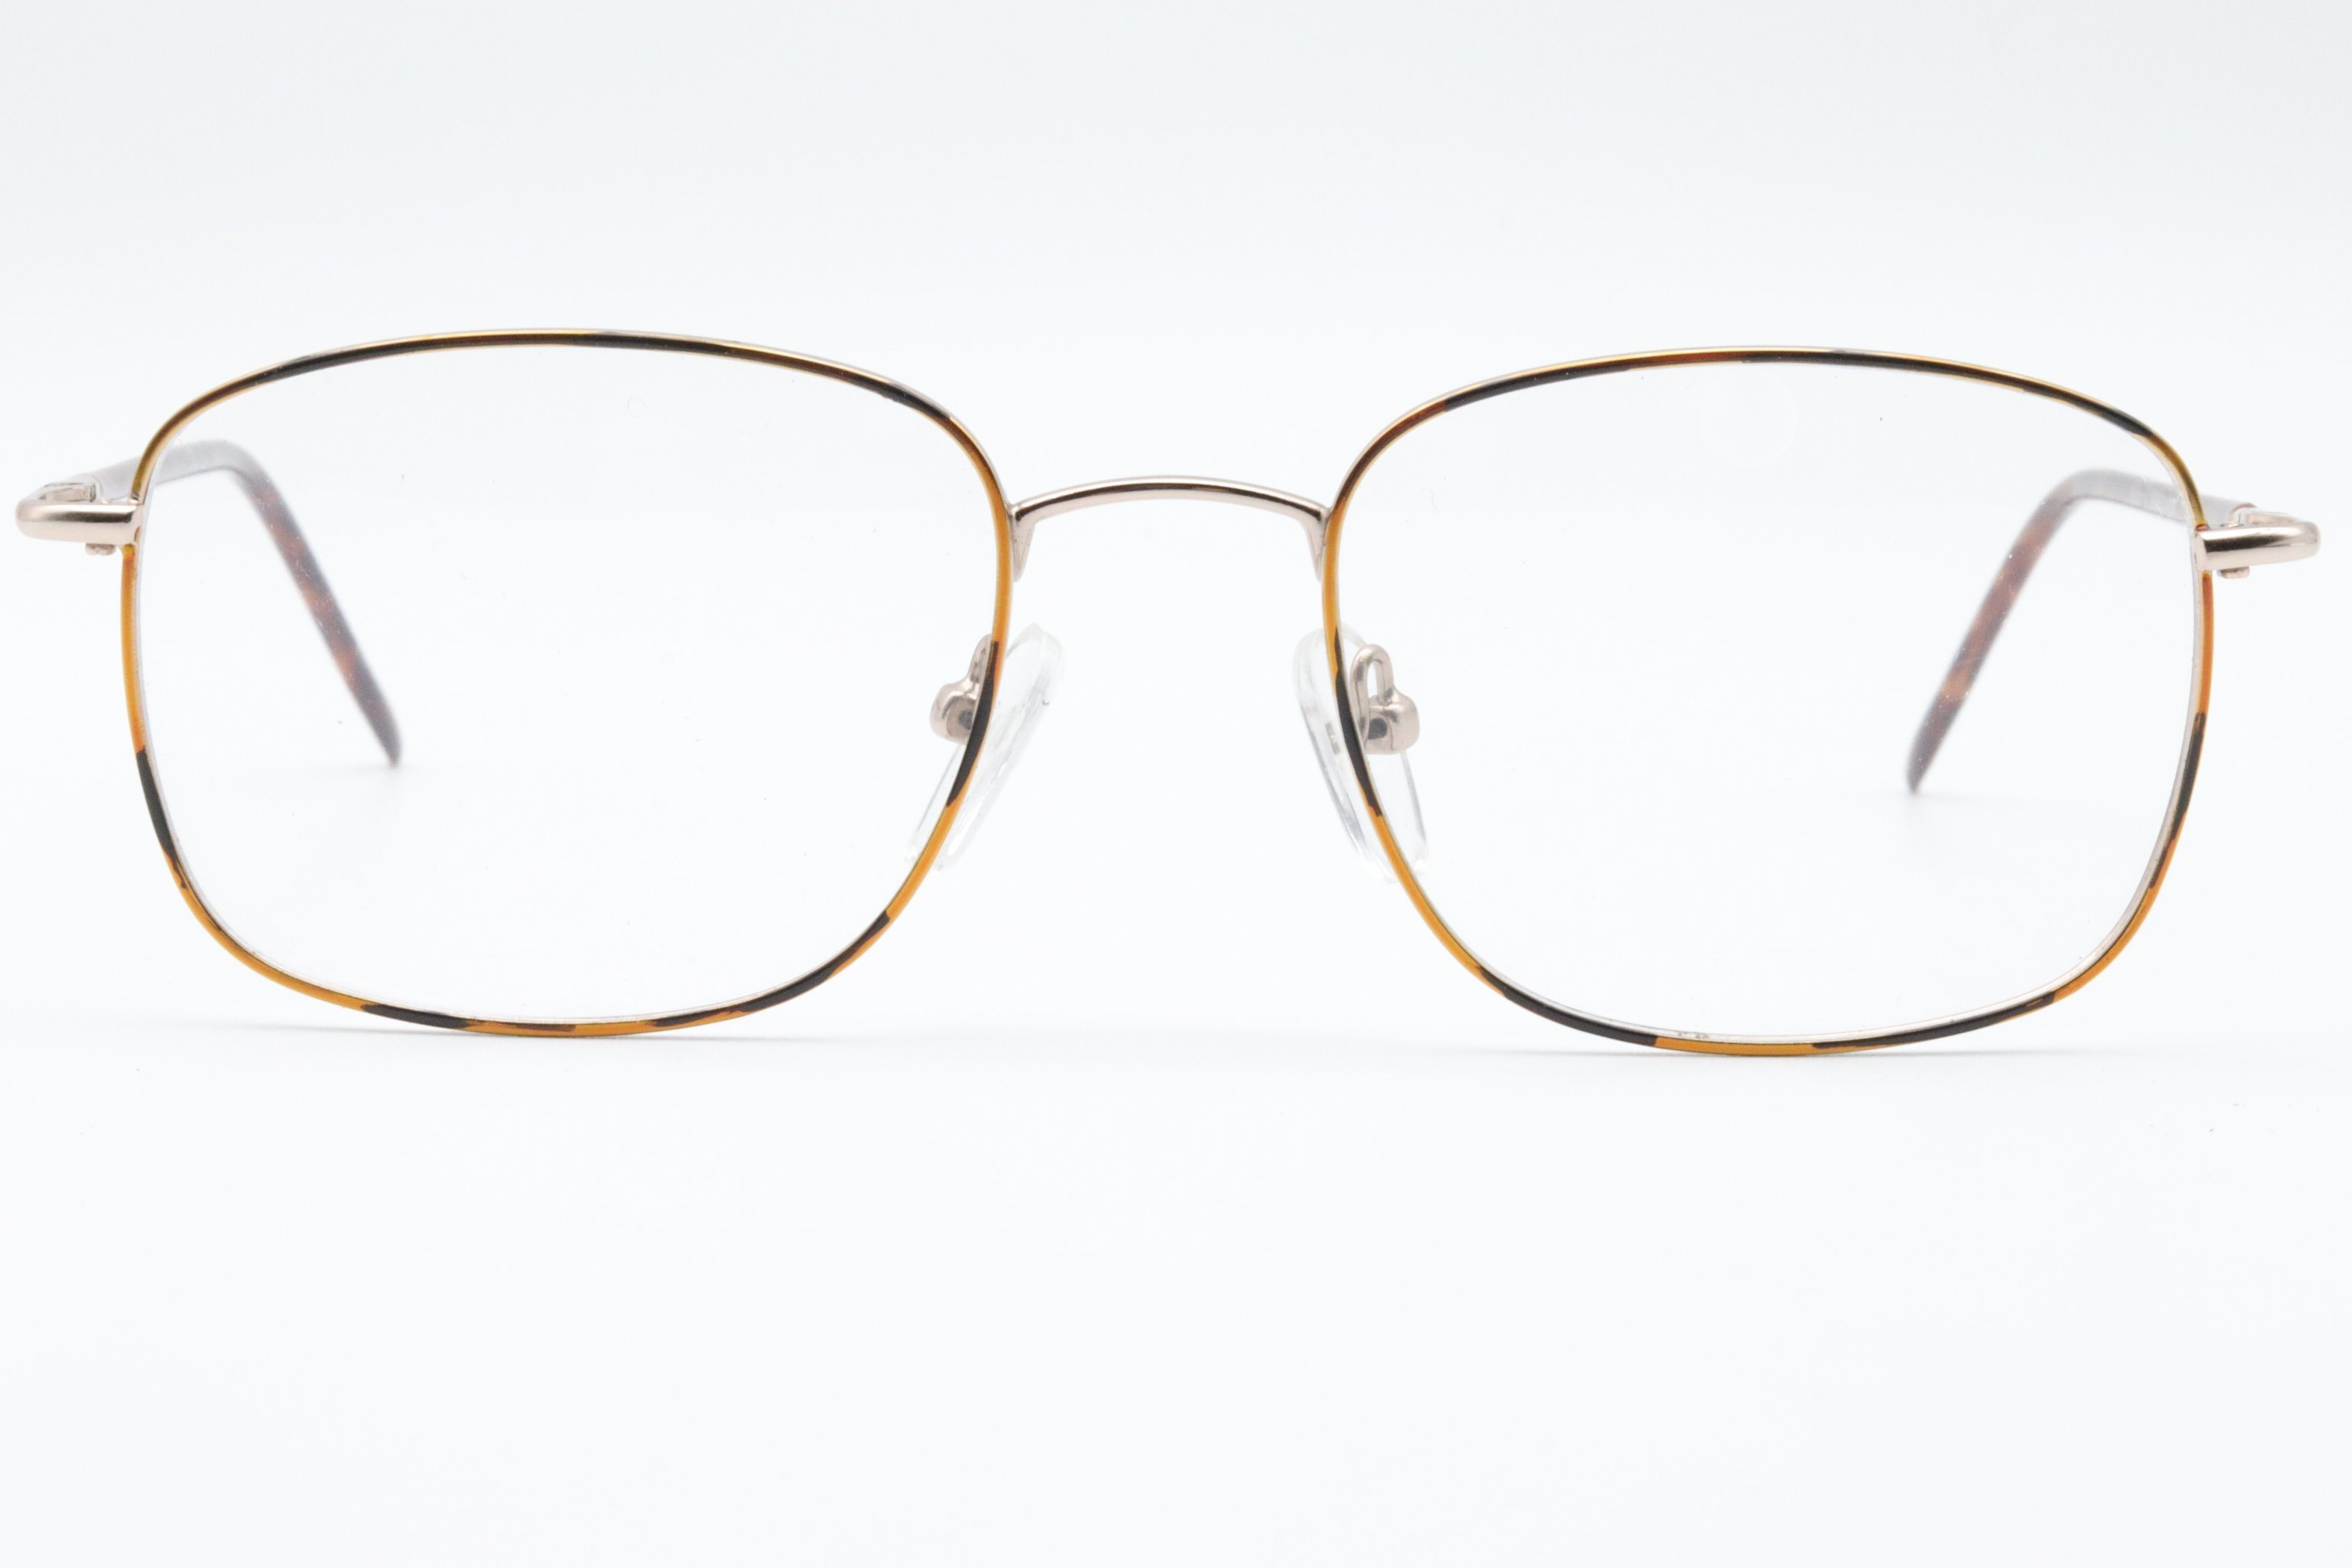 df15de0f0d1 China Popular and Classic America Standard Flexible Metal Optical Frames  Eyeglasses Eyewear Spectacles Fp60 - China Metal Optical Frames